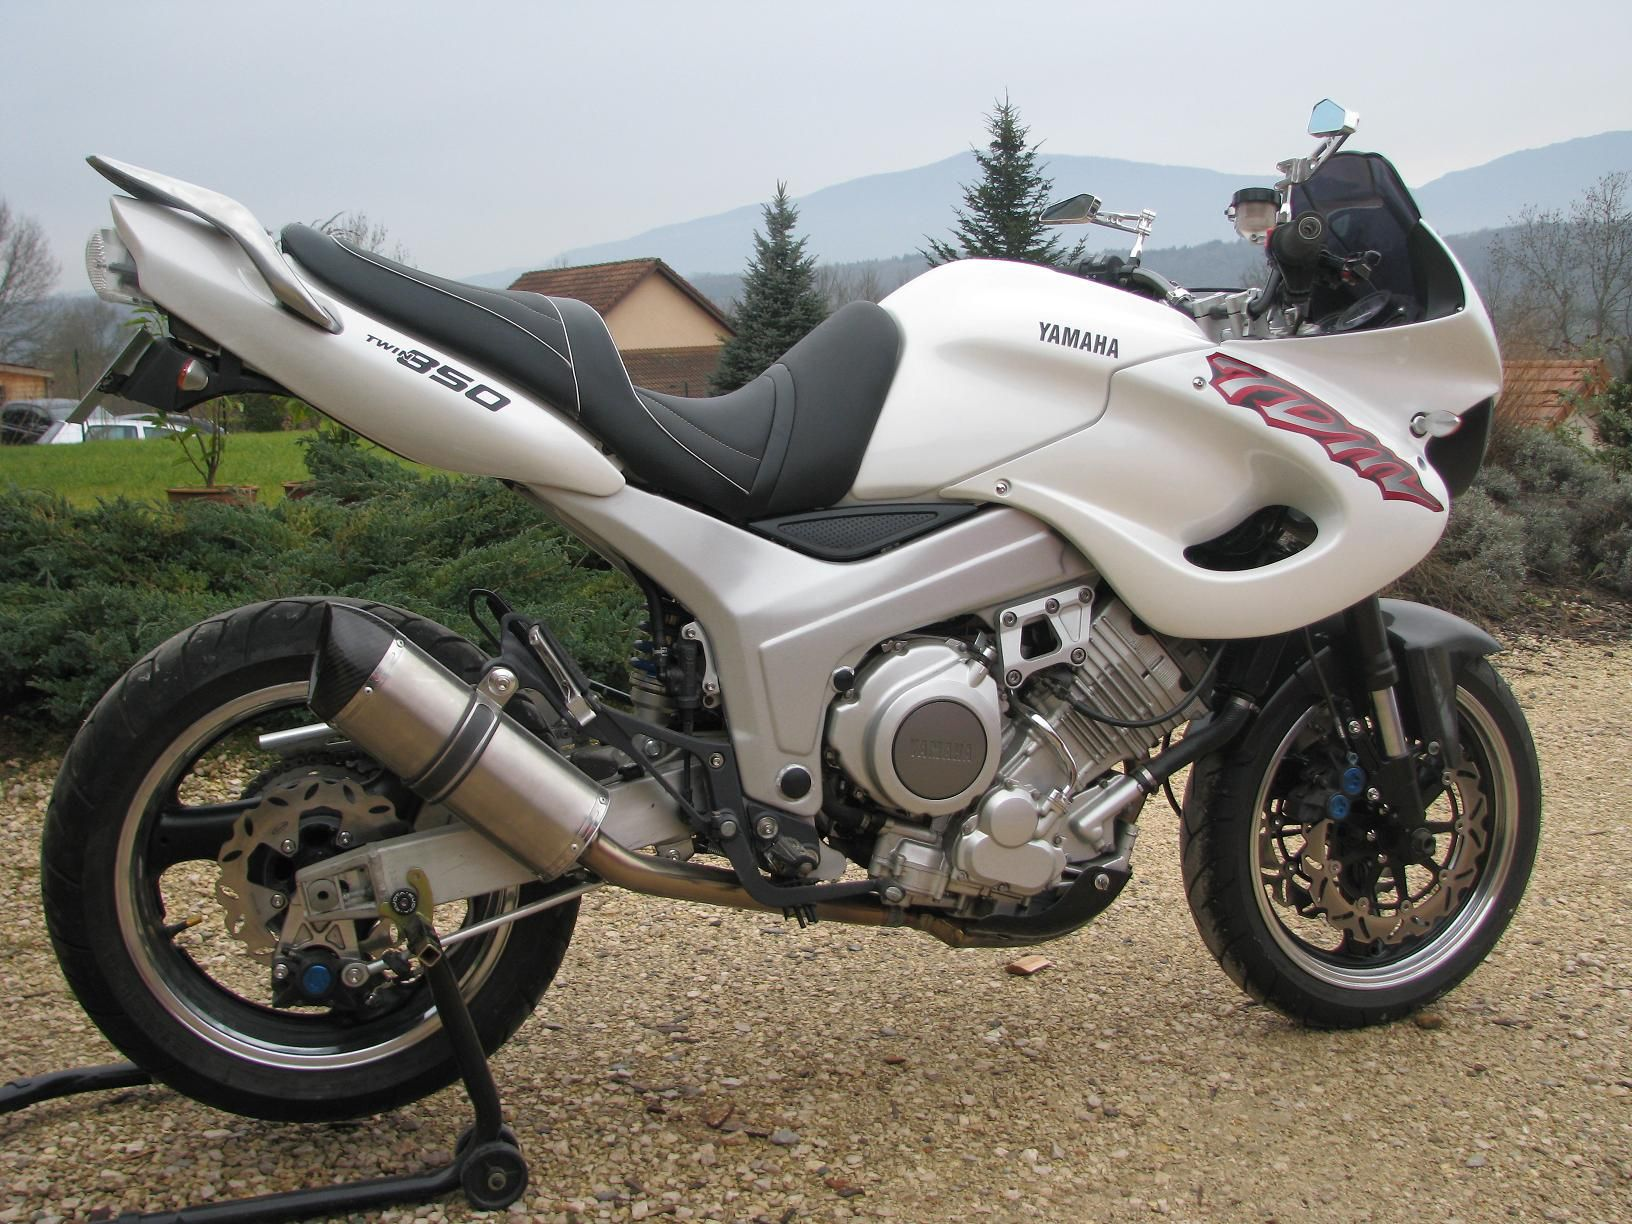 mon tdm 4tx apres modifications tdm 850 motorcycle. Black Bedroom Furniture Sets. Home Design Ideas